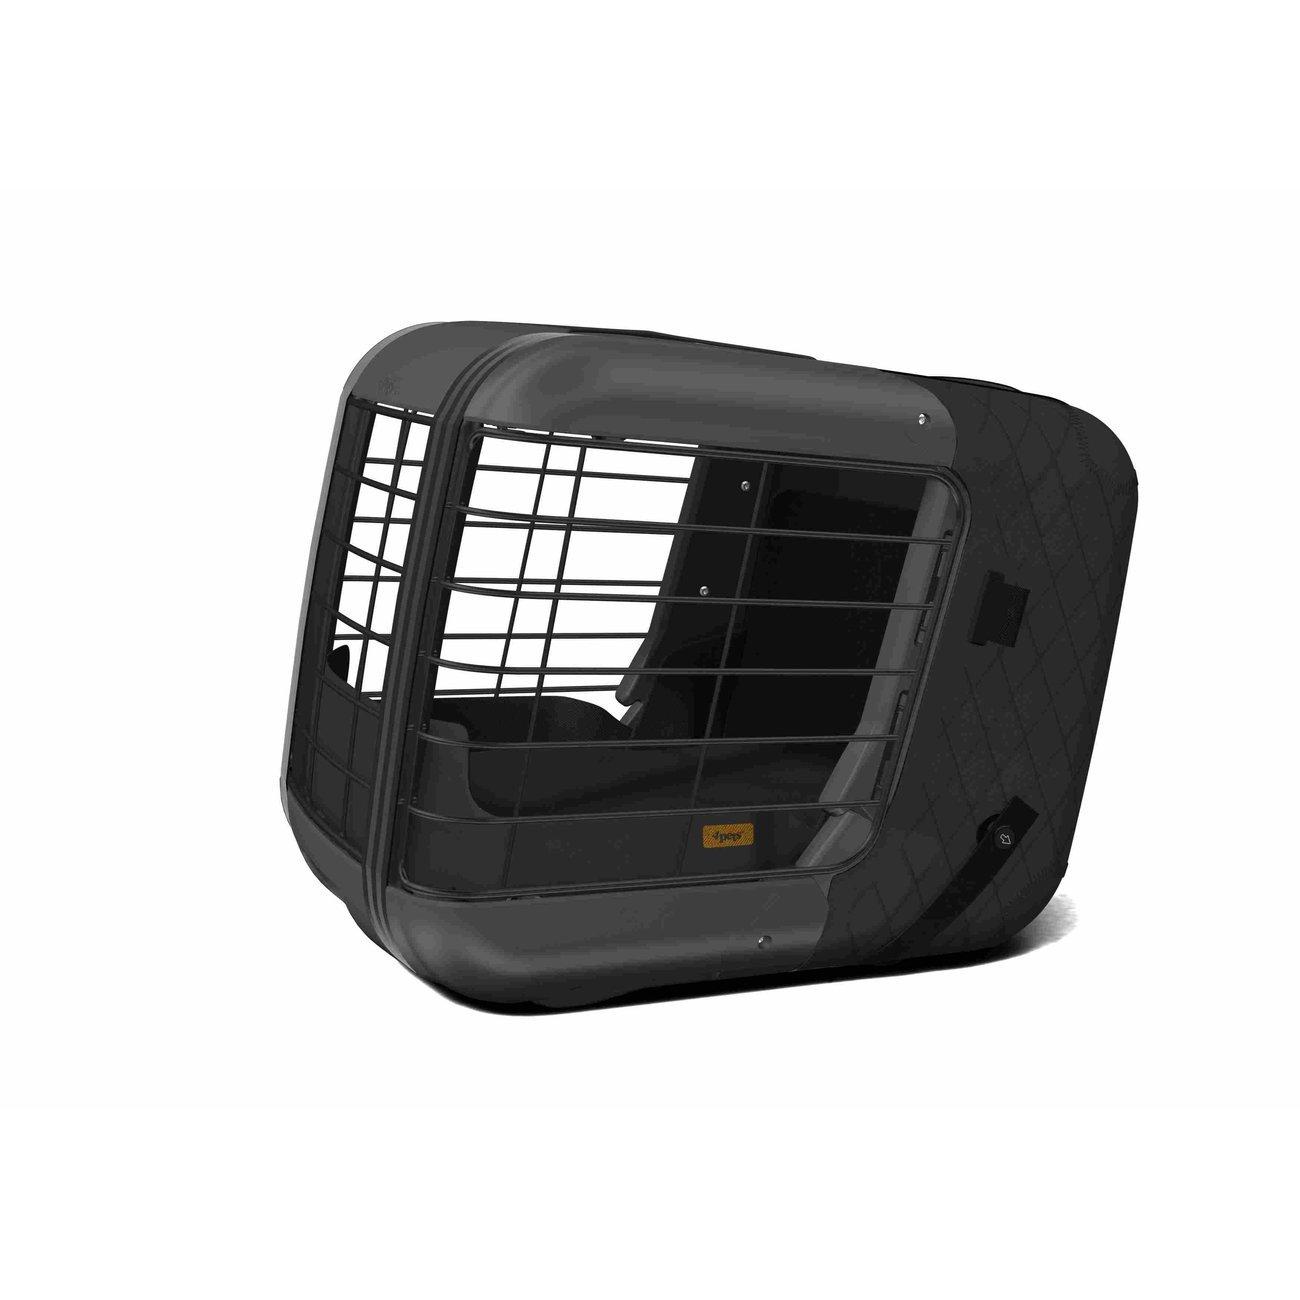 4pets Dog Caree Hundebox Transportbox für Hunde, Bild 9